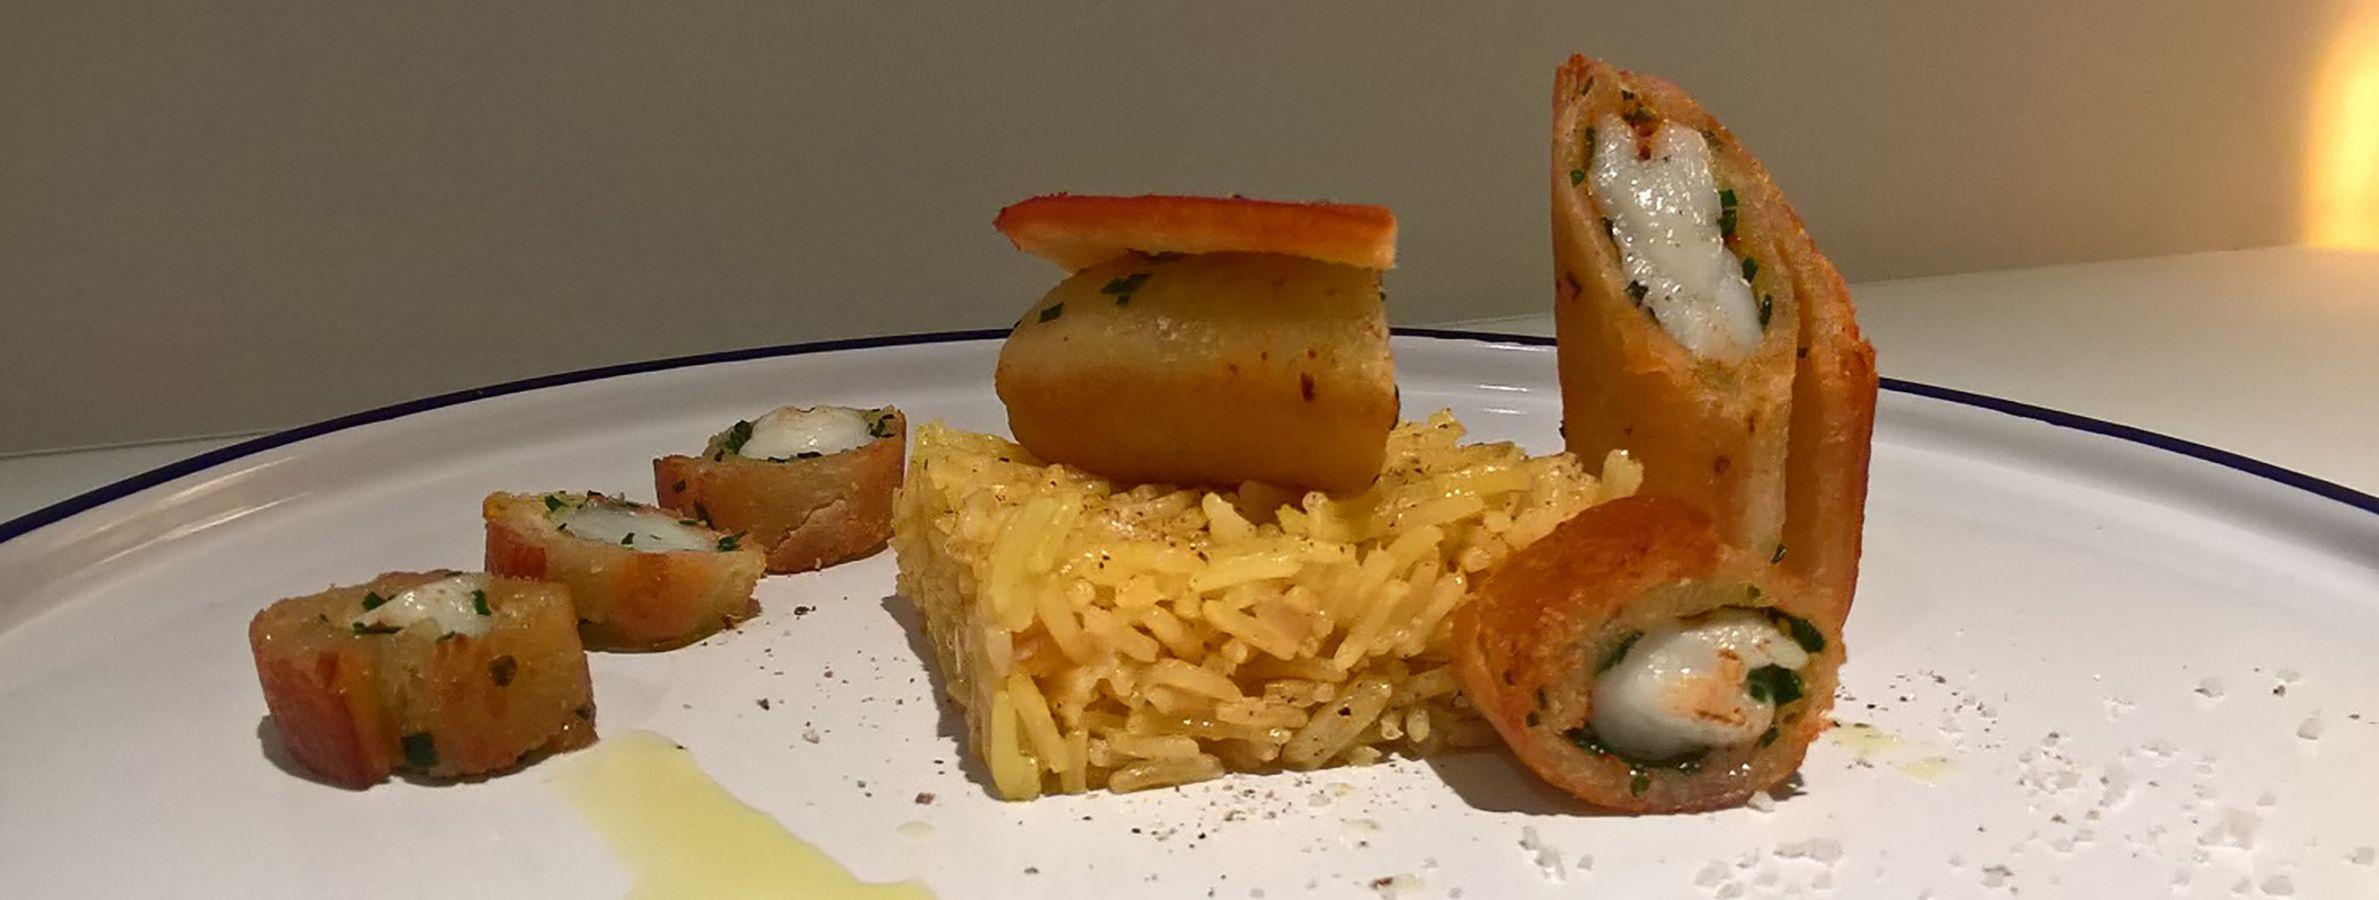 Foto-Gastronomie-b